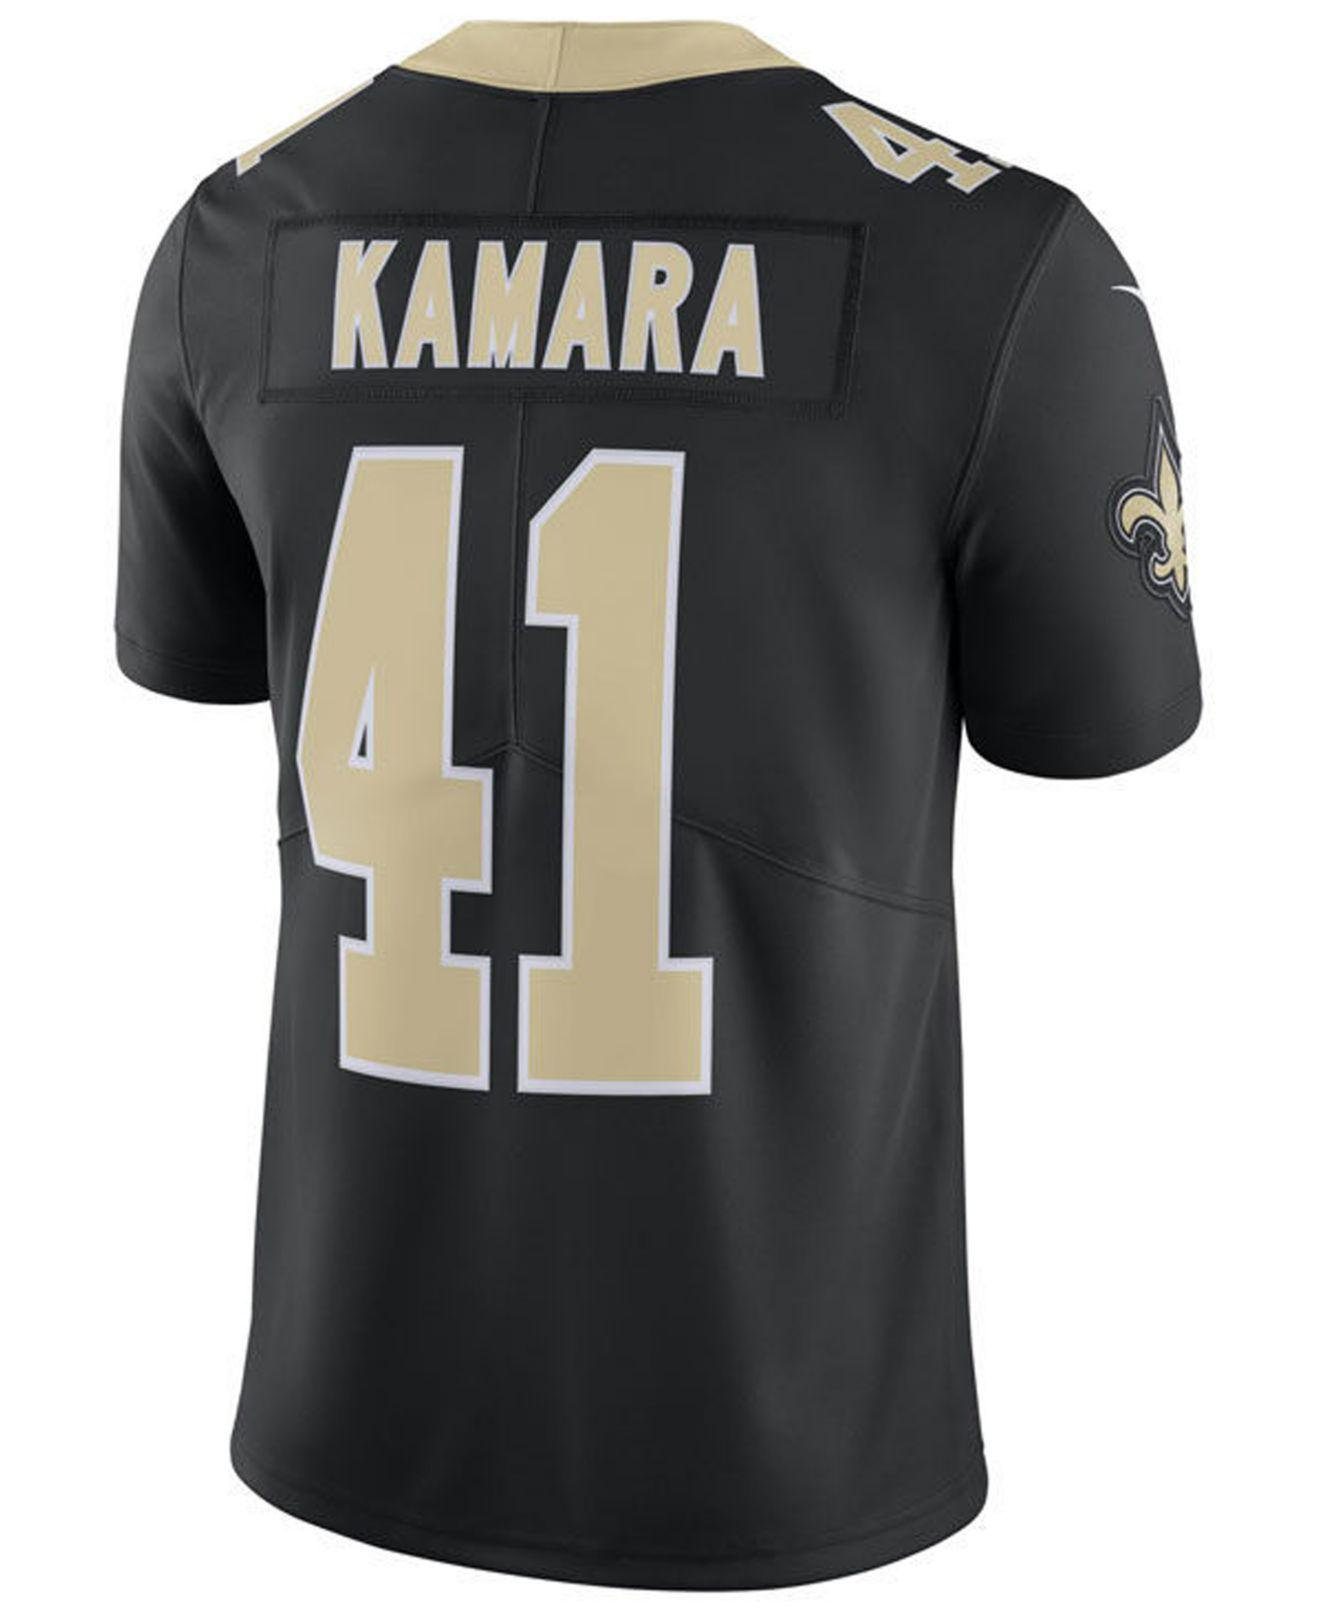 New Orleans Saints T Shirt Jersey - BCD Tofu House 68791bb16